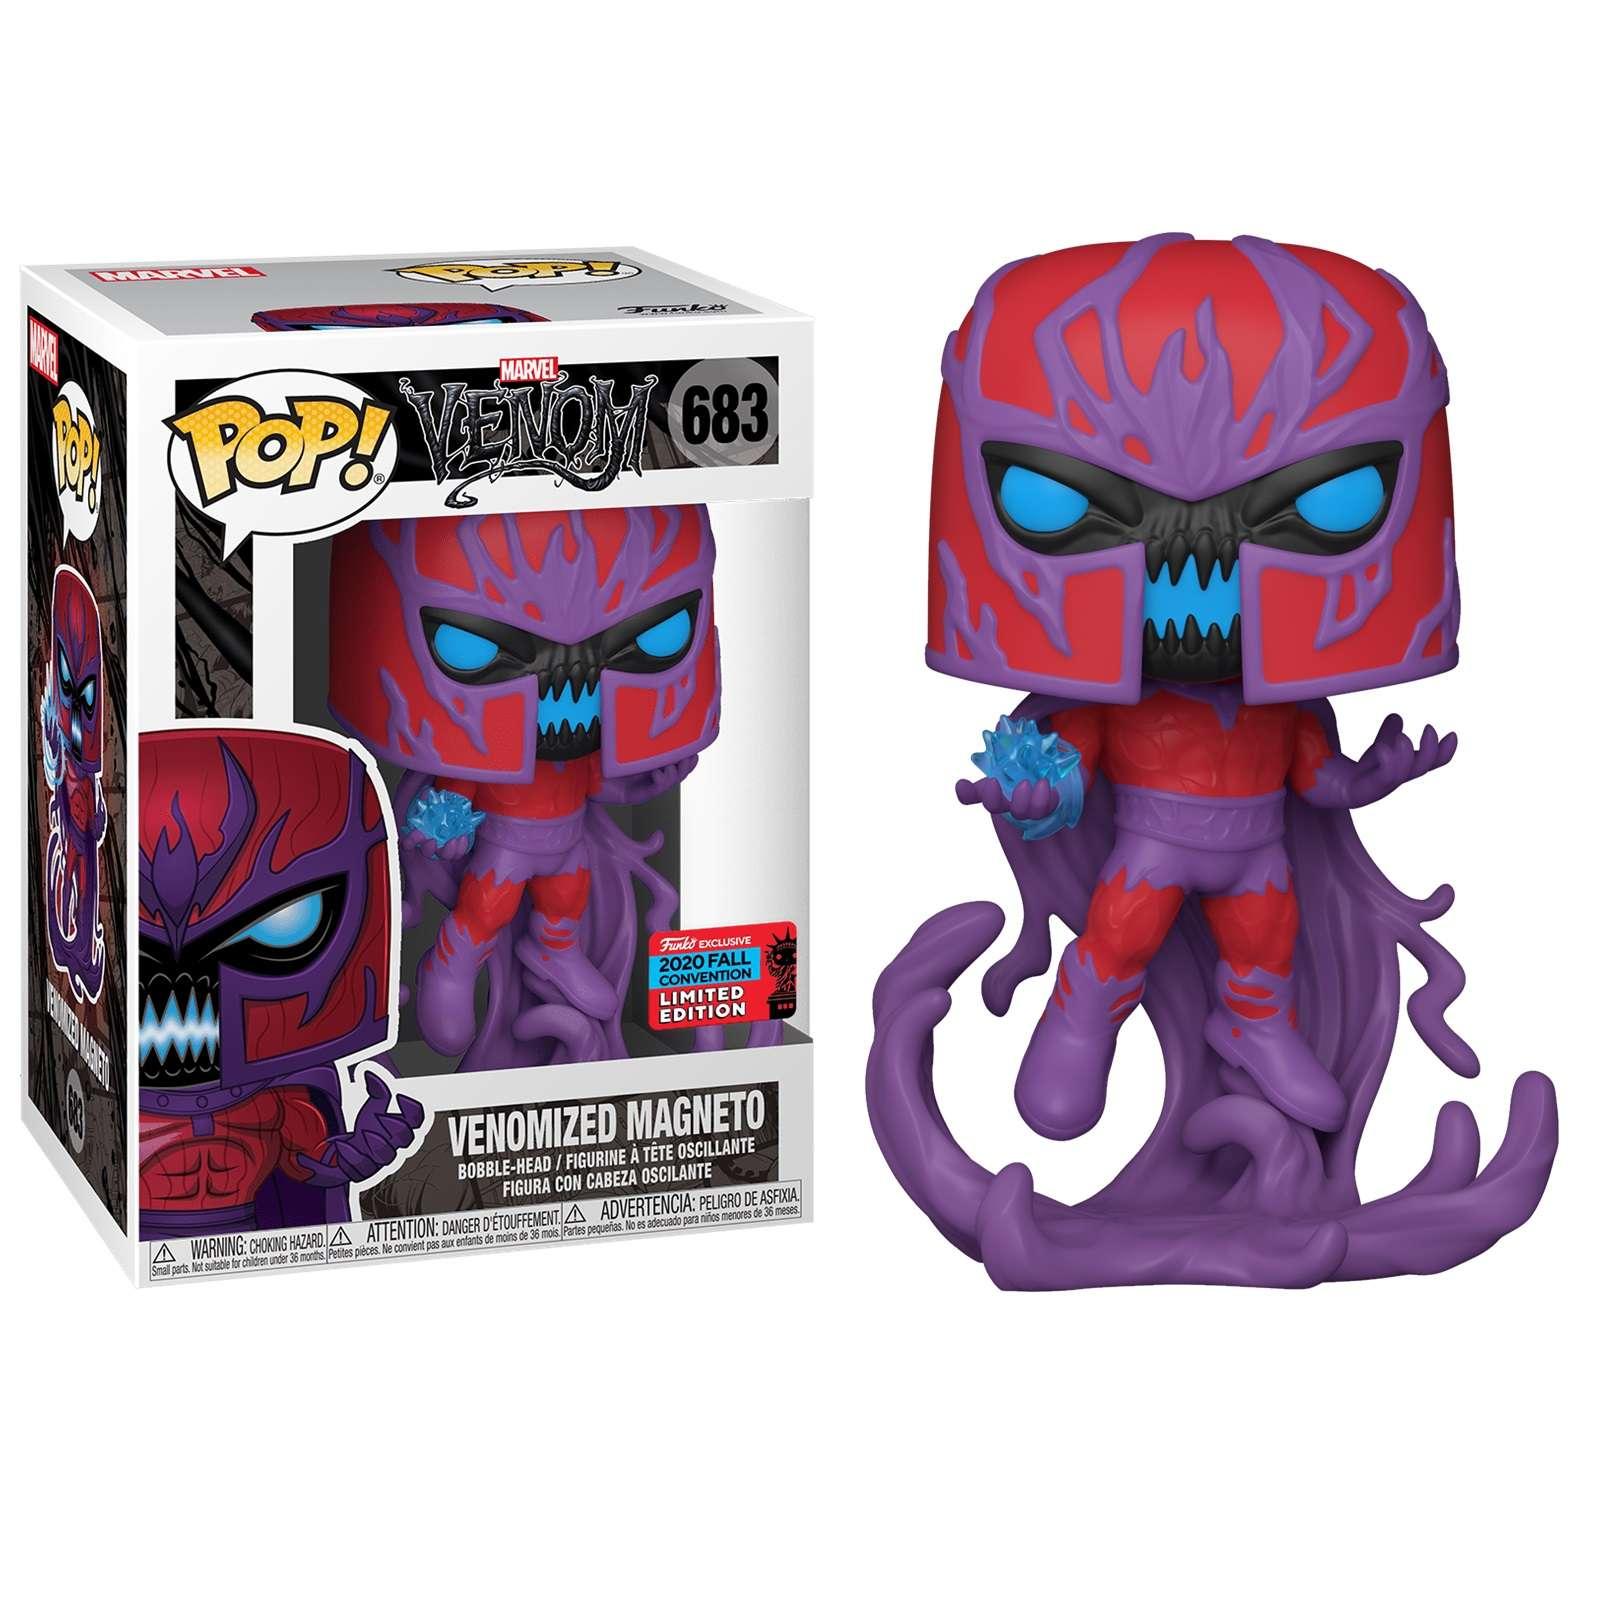 POP!: Venom - Venomized Magneto (NYCC 2020) Photo